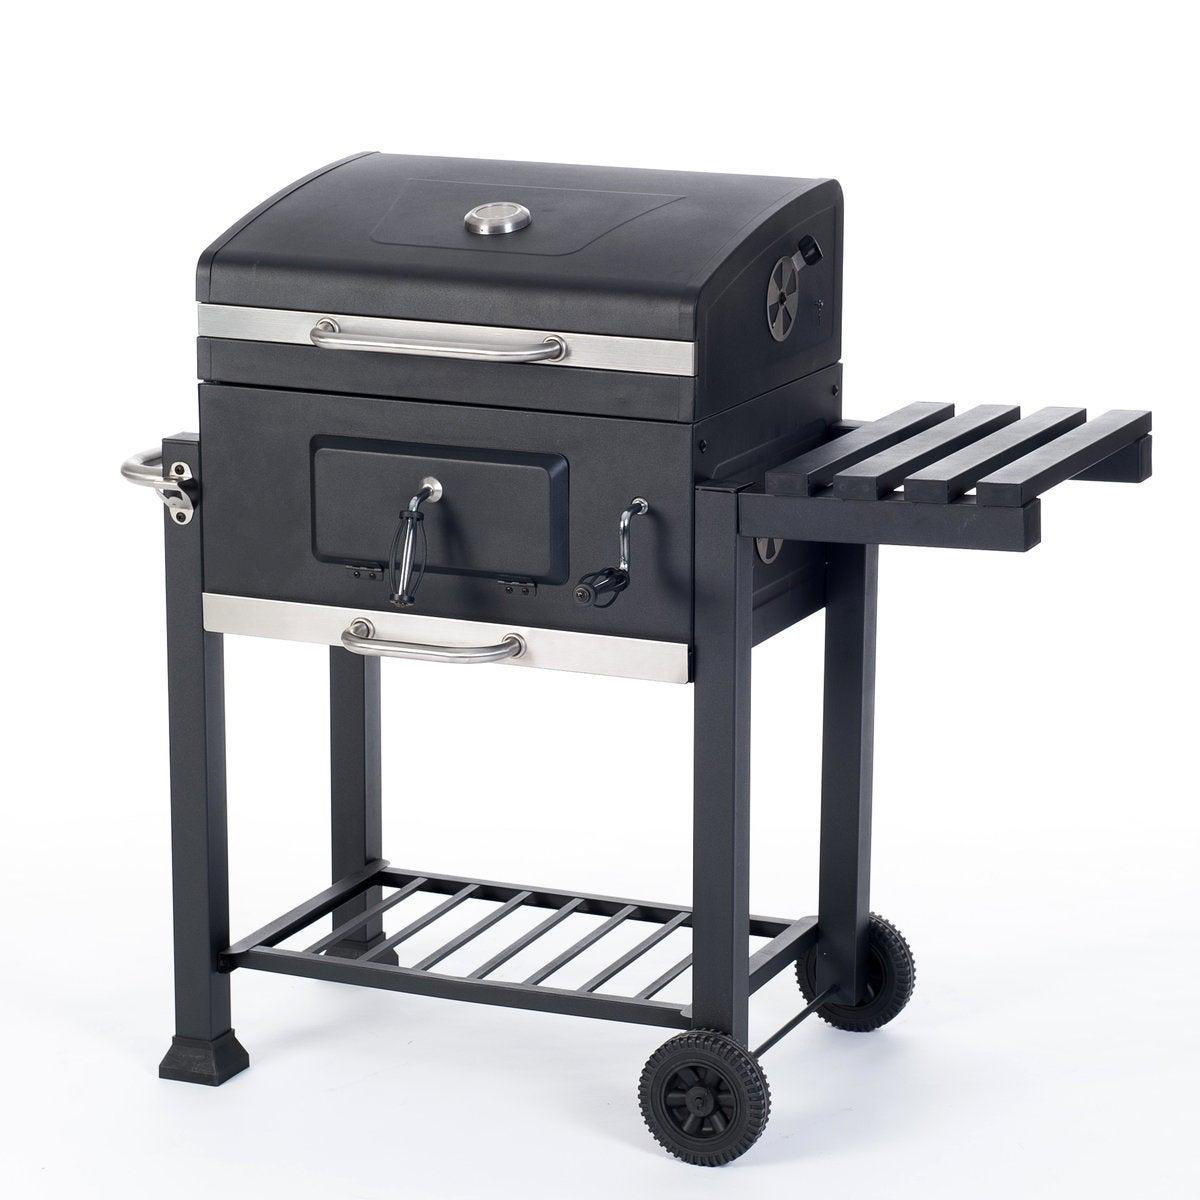 Intratuin houtskoolbarbecue Topgrill 115 x 54 x 106 cm grijs